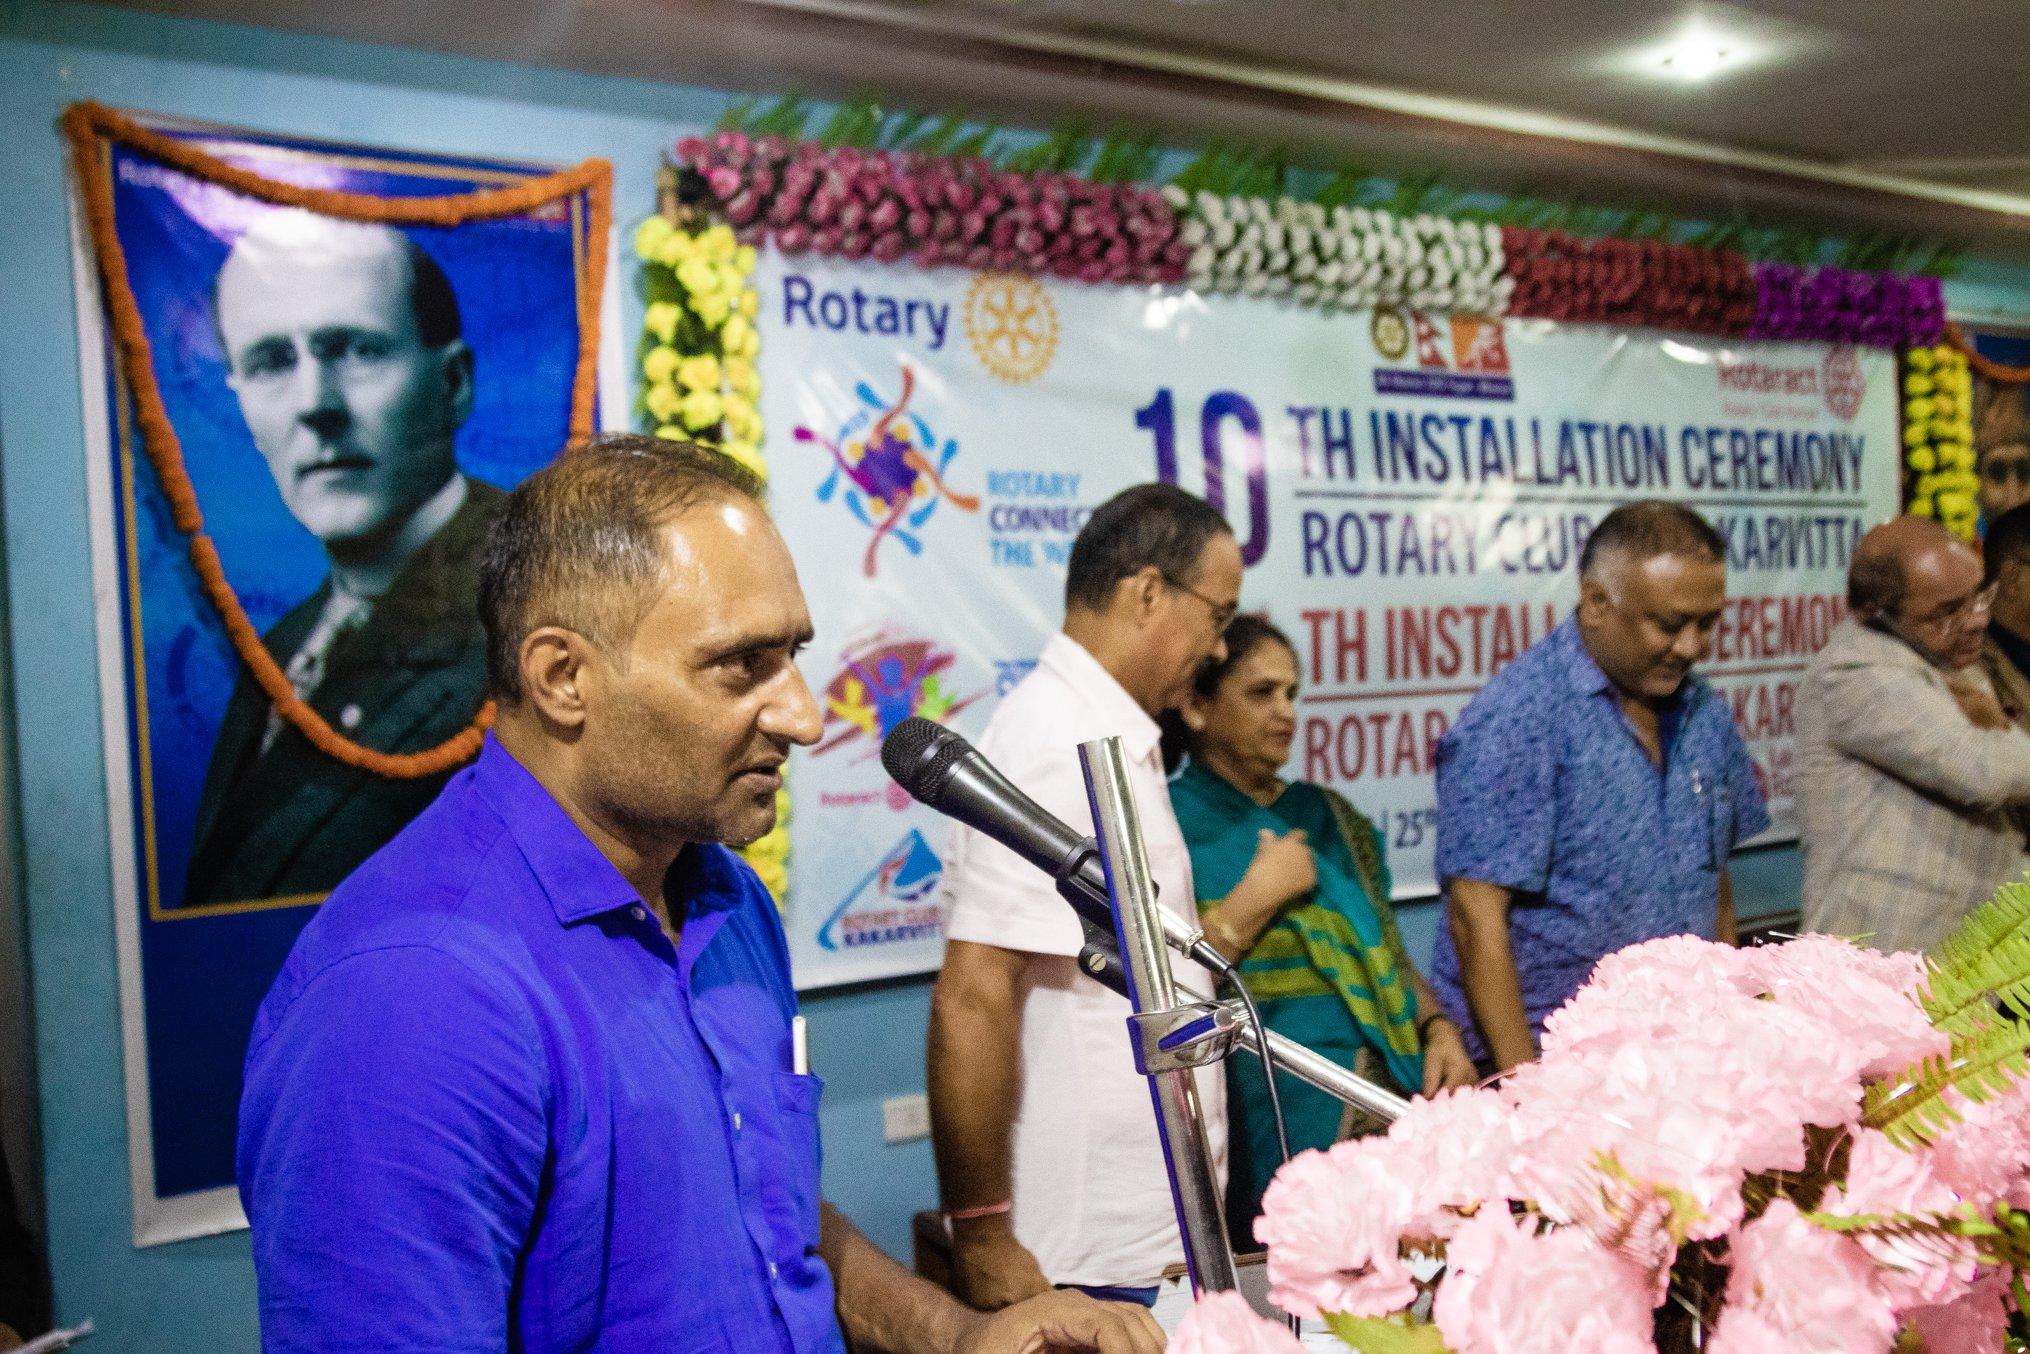 10th Installation Ceremony Rotary Club Of Kakarvitta 65